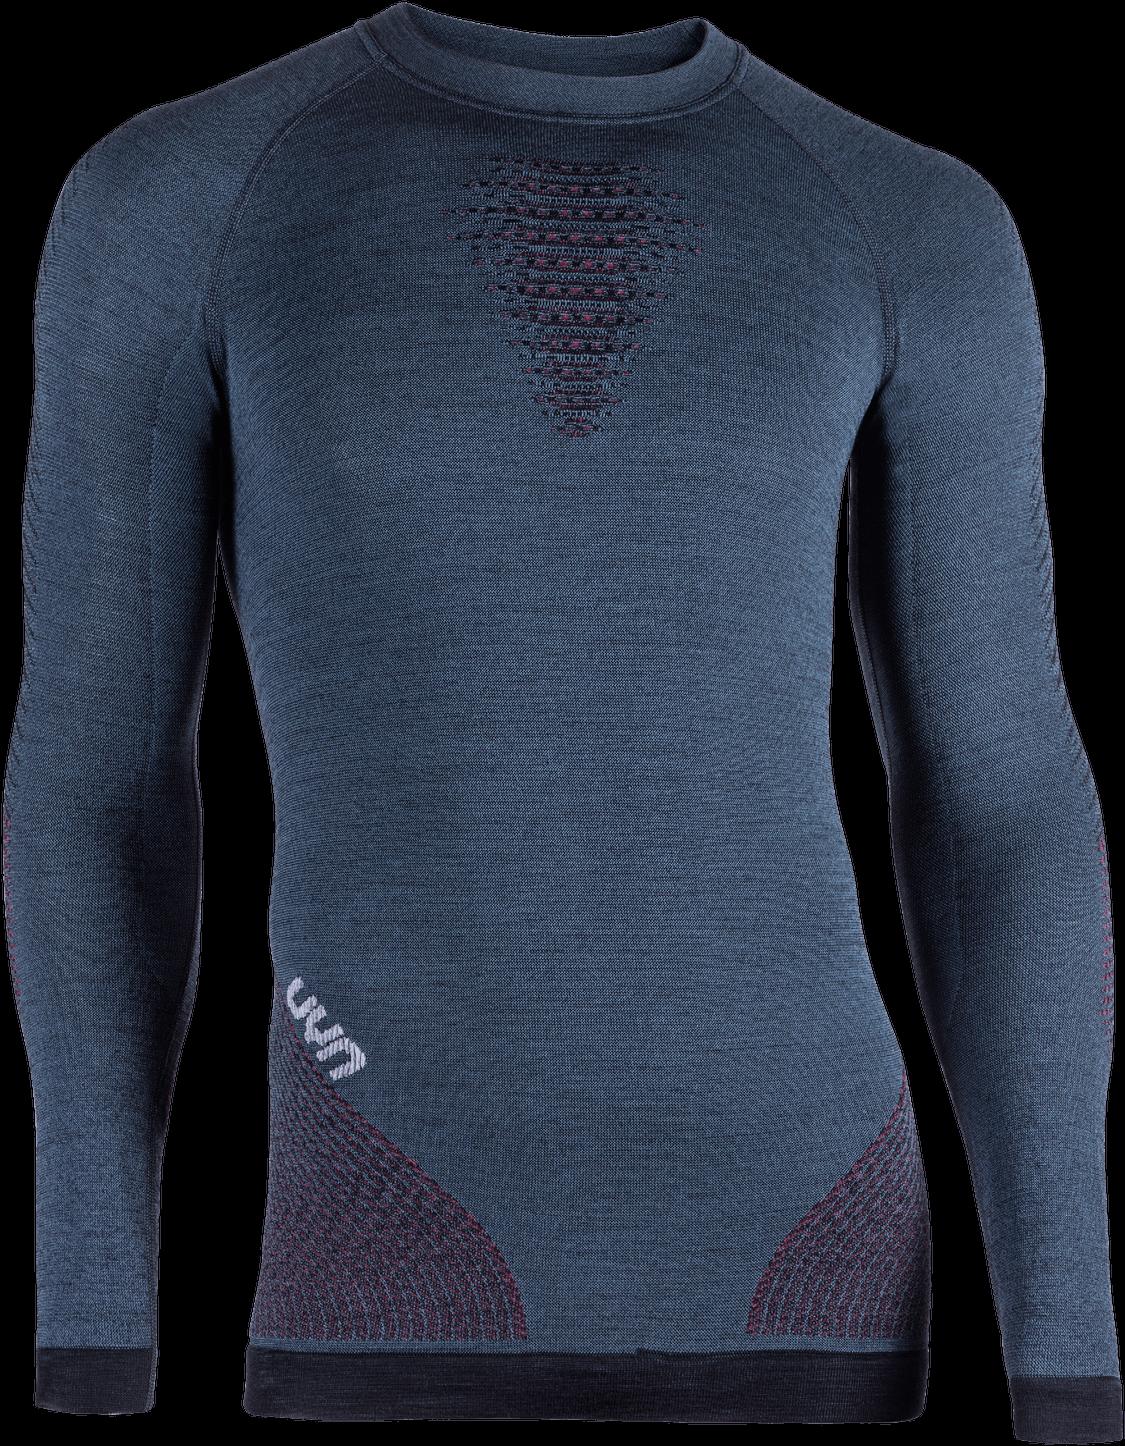 UYN - tričko T FUSYON UW SHIRT LG_SL. orion blue/bordeaux/pearl grey Velikost: S/M